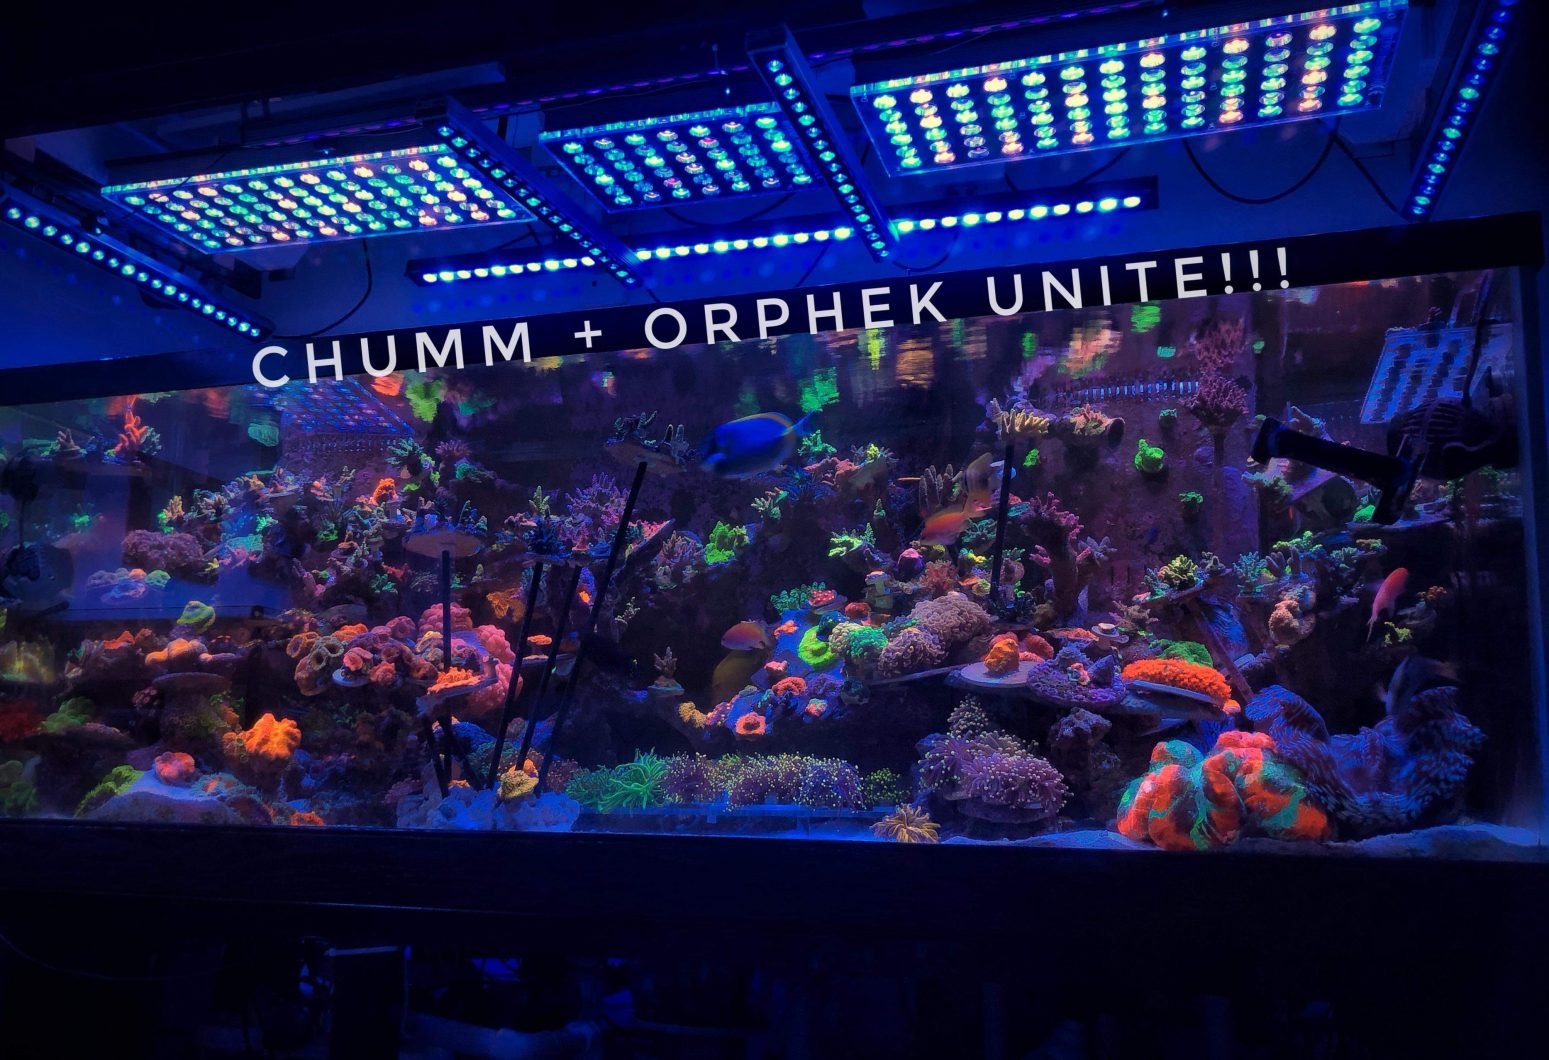 orphek najbolja grebena LED svjetla 2020